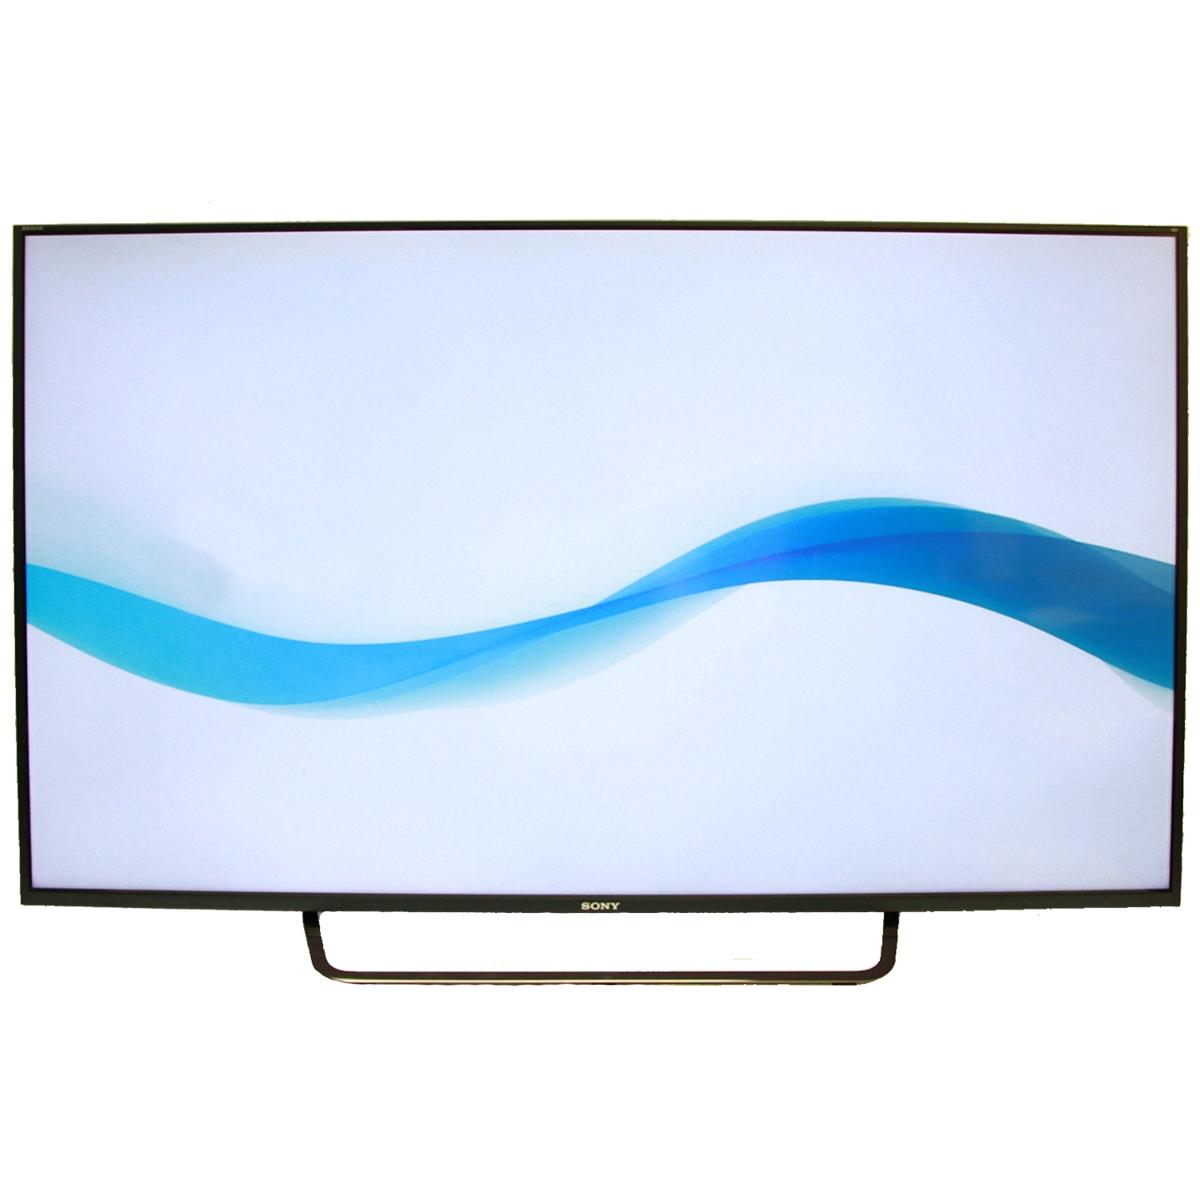 Sony 49inch XBR Series LED 4K Ultra HDTV - XBR-49X830C